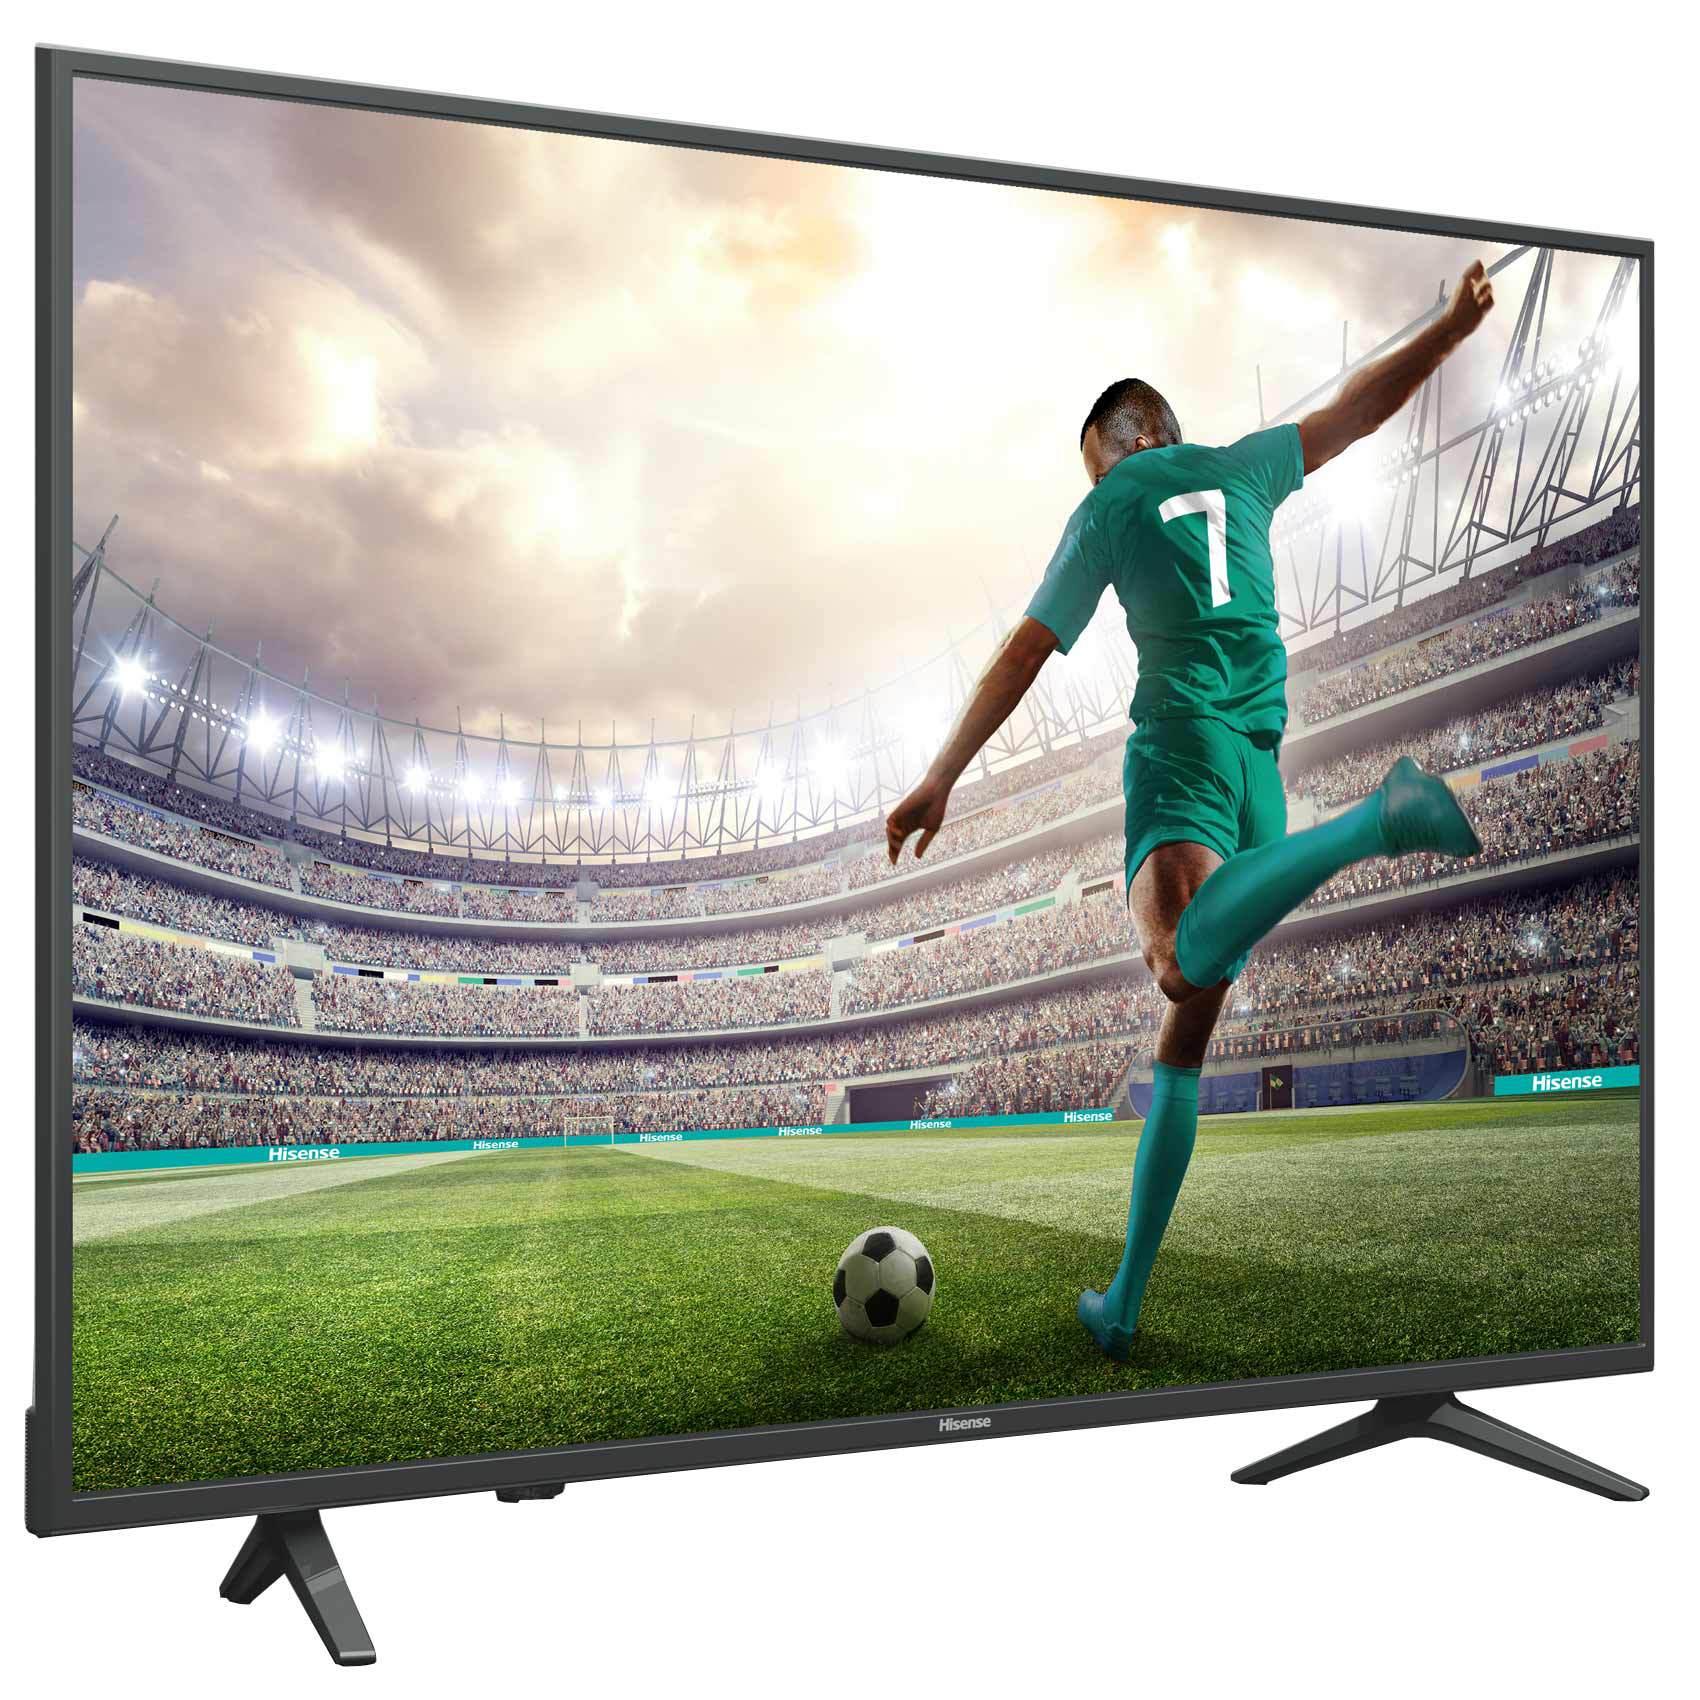 HISENSE UHD SMART TV 43